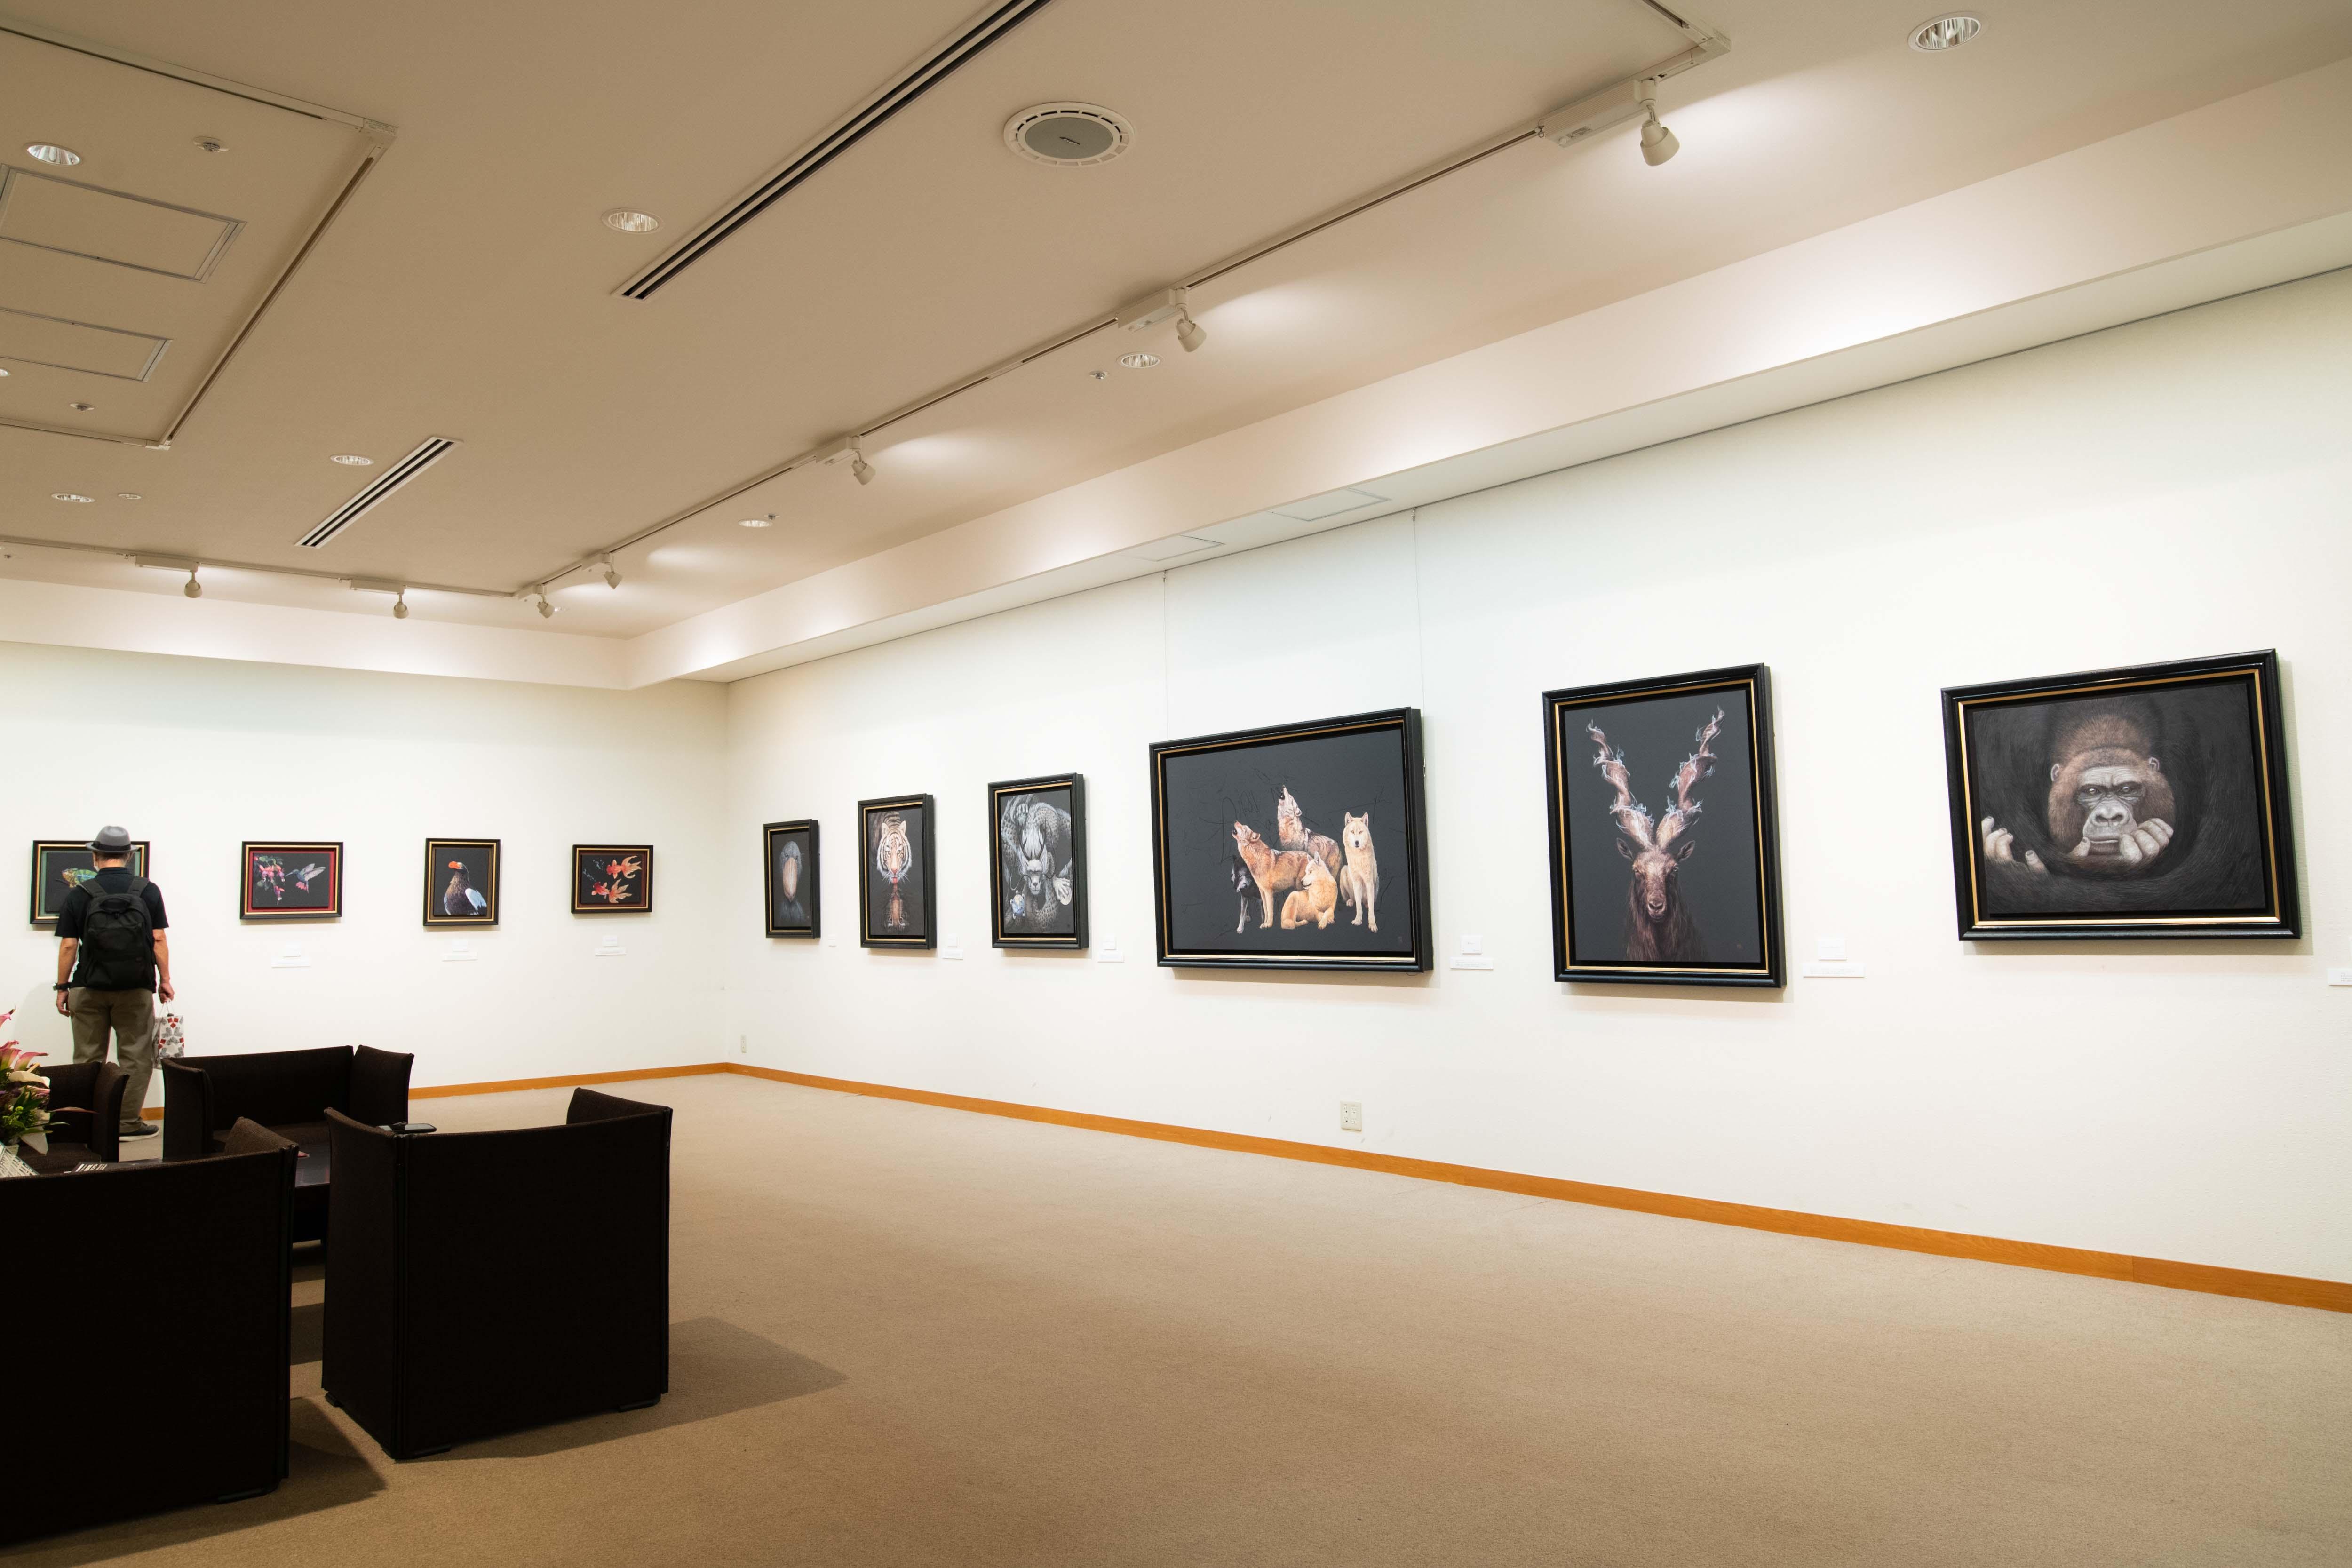 https://kanakokinutani.com/exhibition/image/S20201007-033.jpg